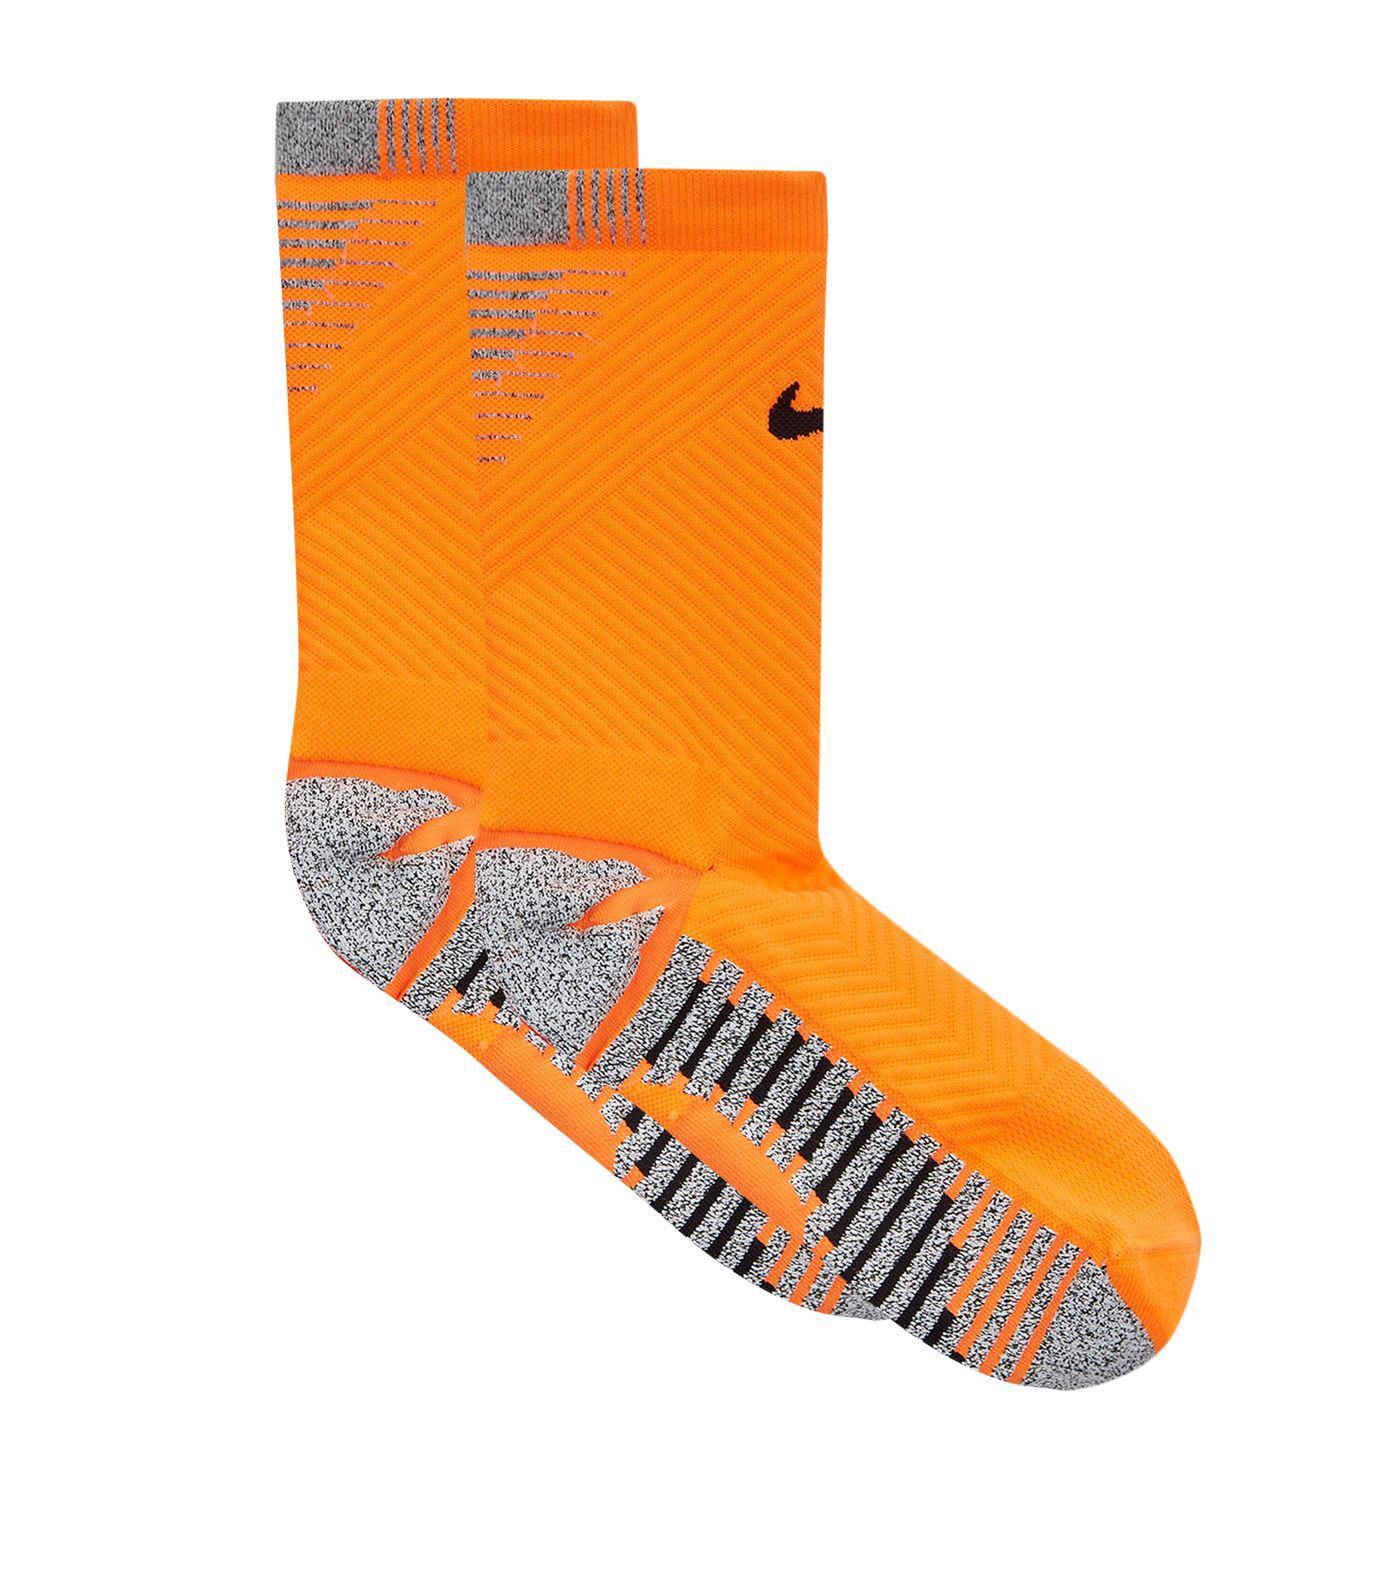 en términos de vertical Transitorio  adidas Parley Socks in White for Men - Lyst